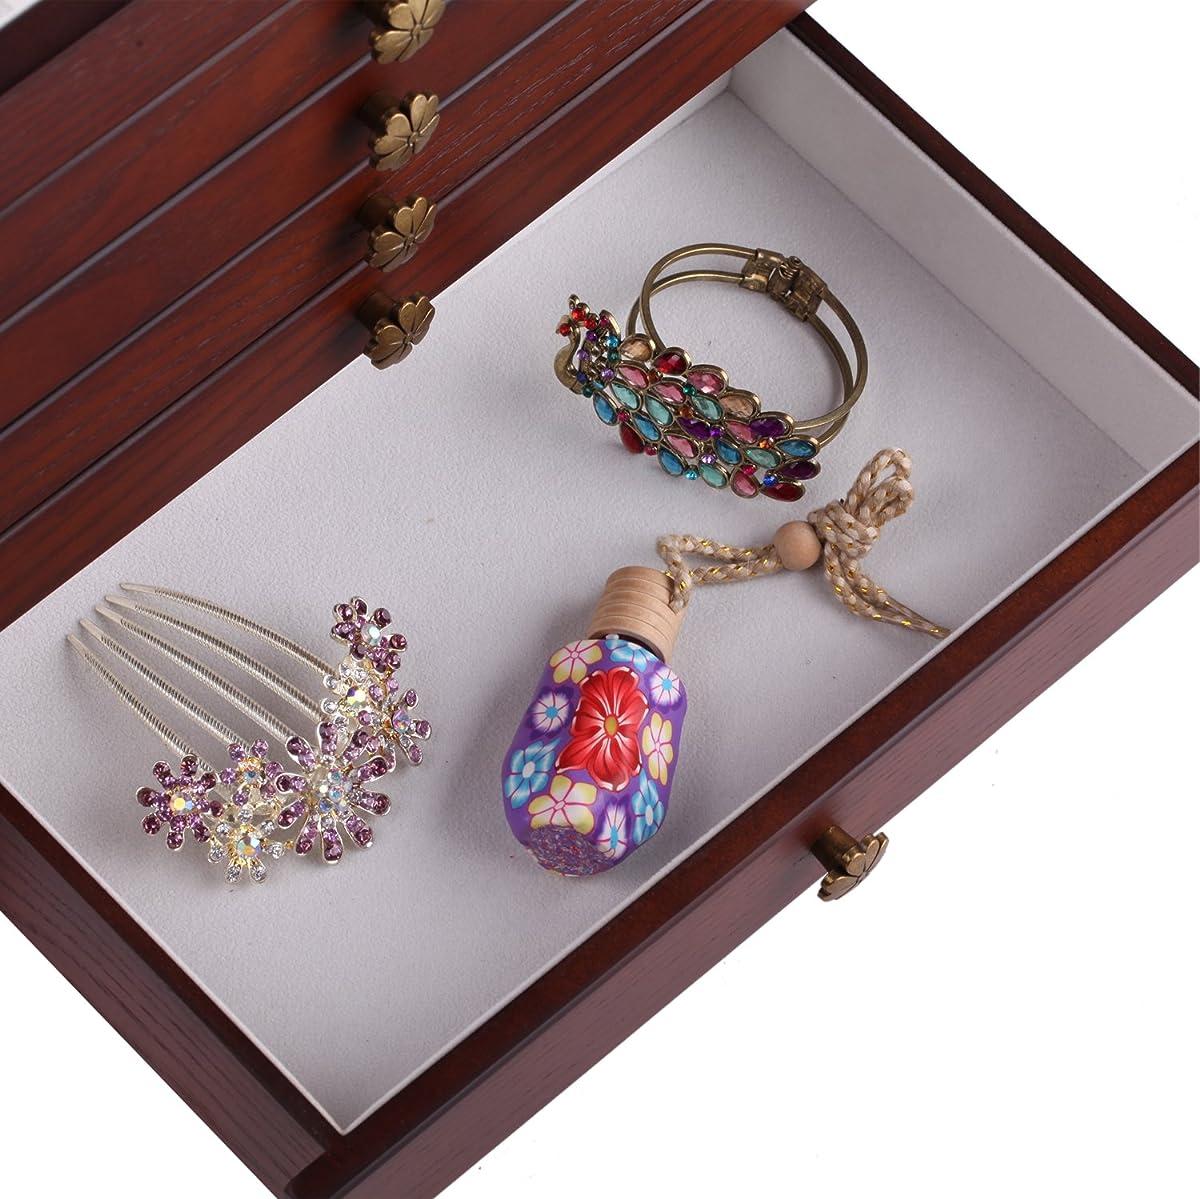 Large Wooden Jewellery Box Armoire Earrling Bracelet Organizer 6 Layers Mirror (BROWN)